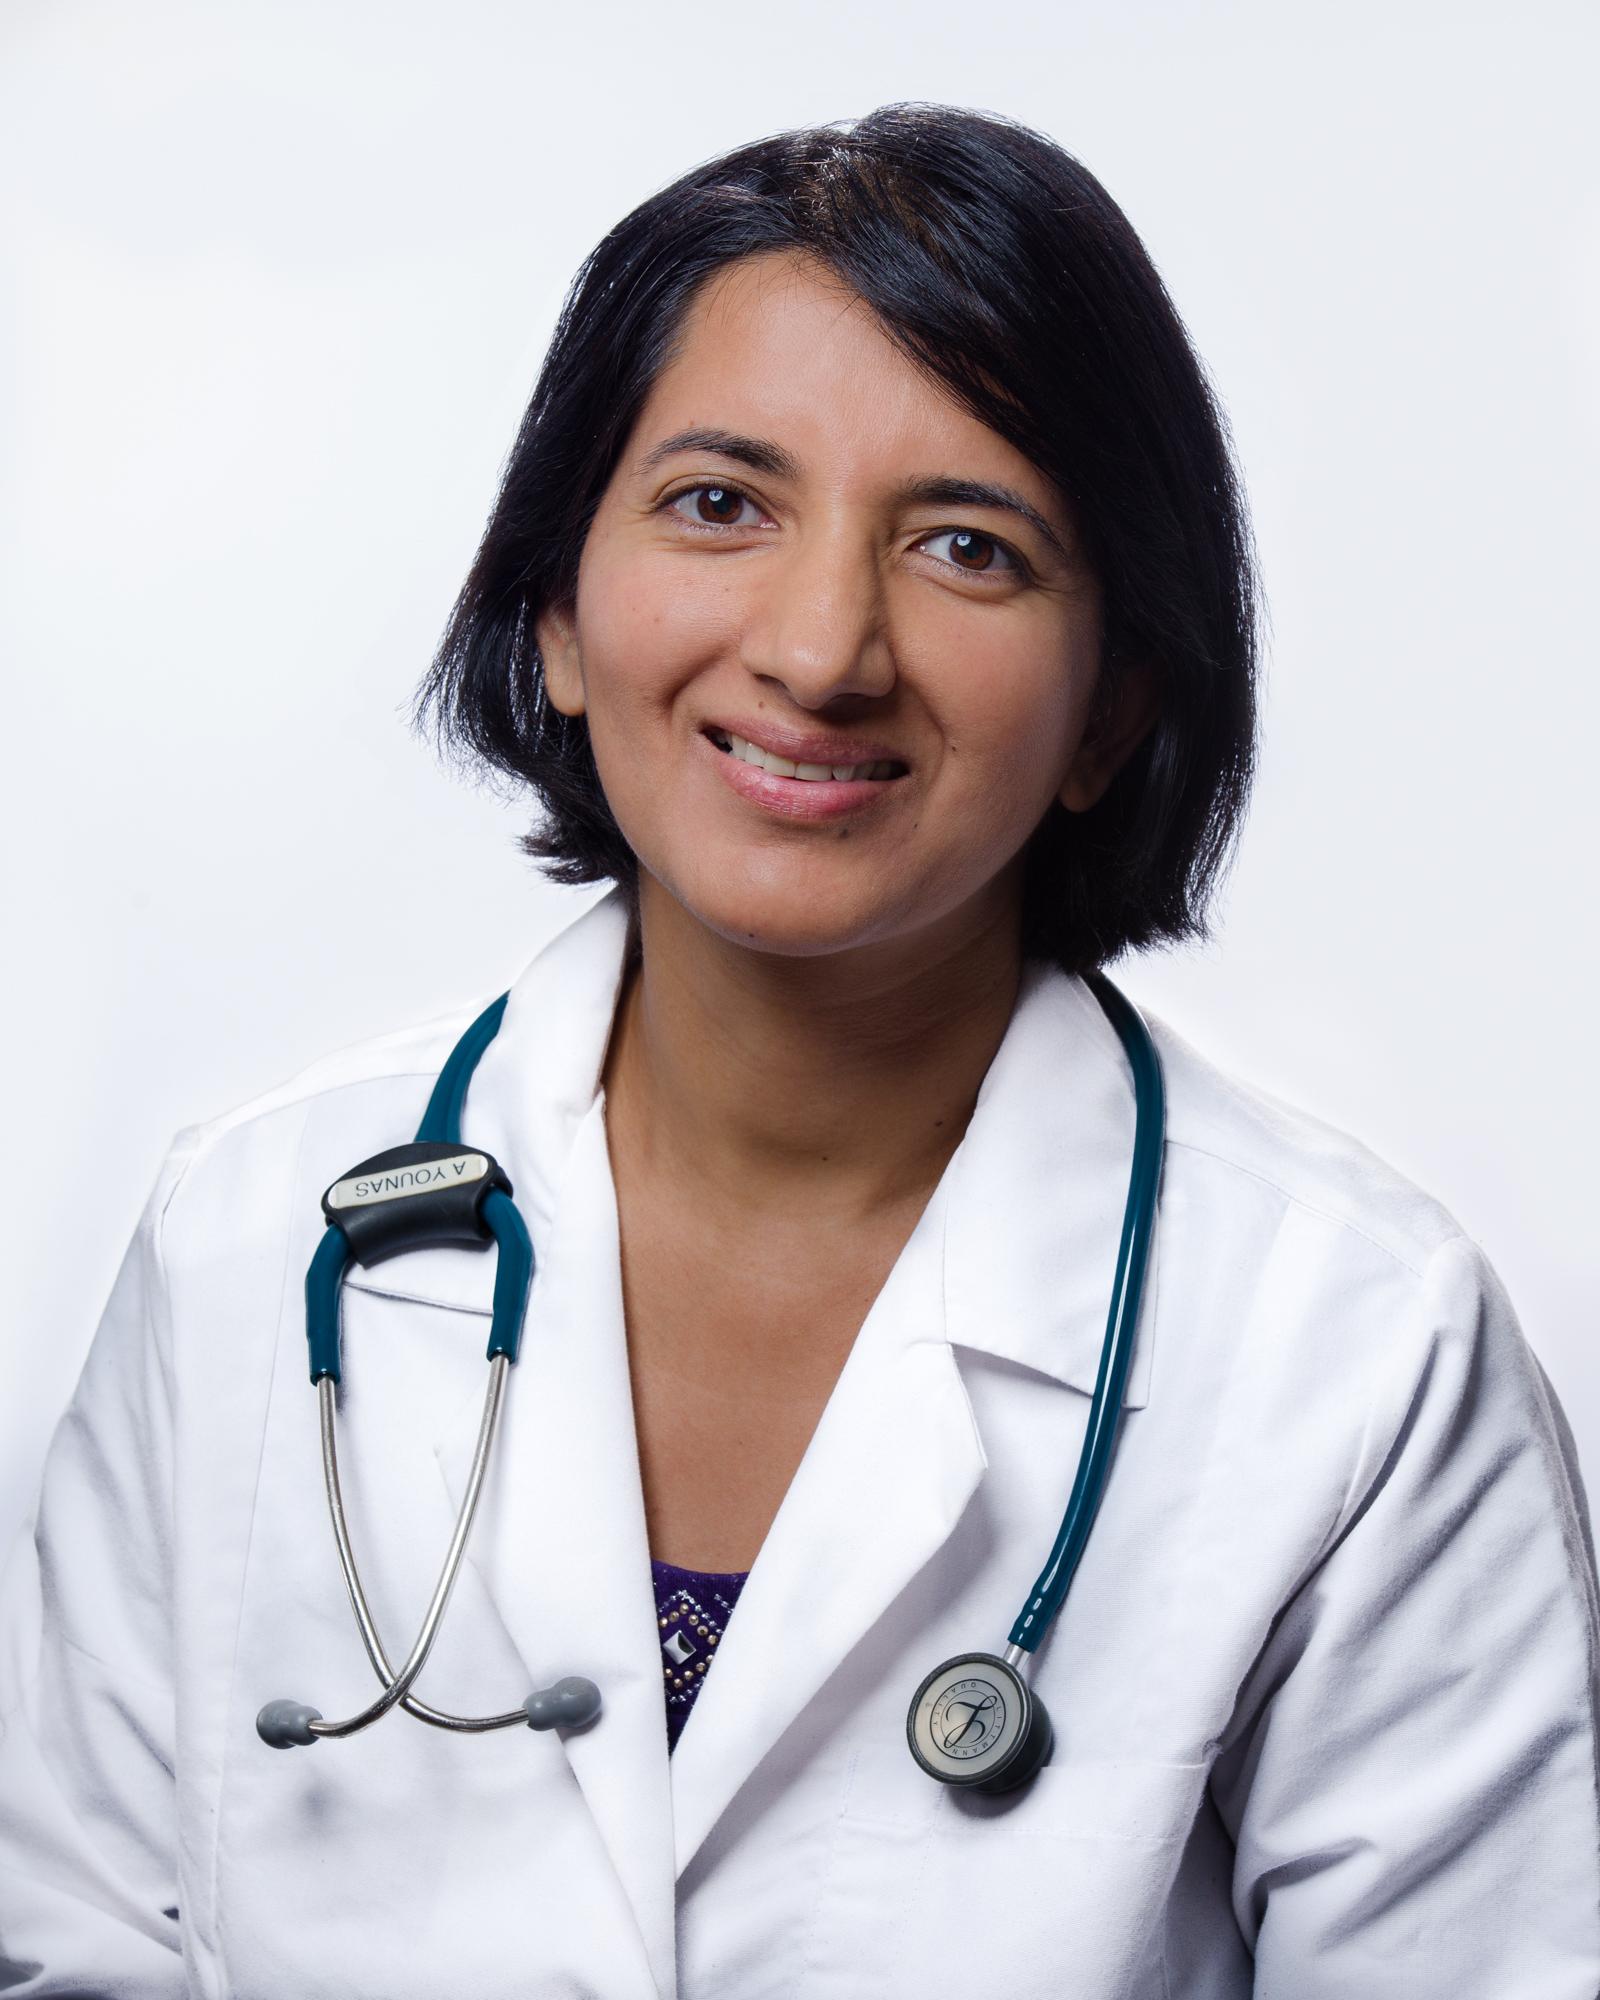 Ayesha Younas, M.D.